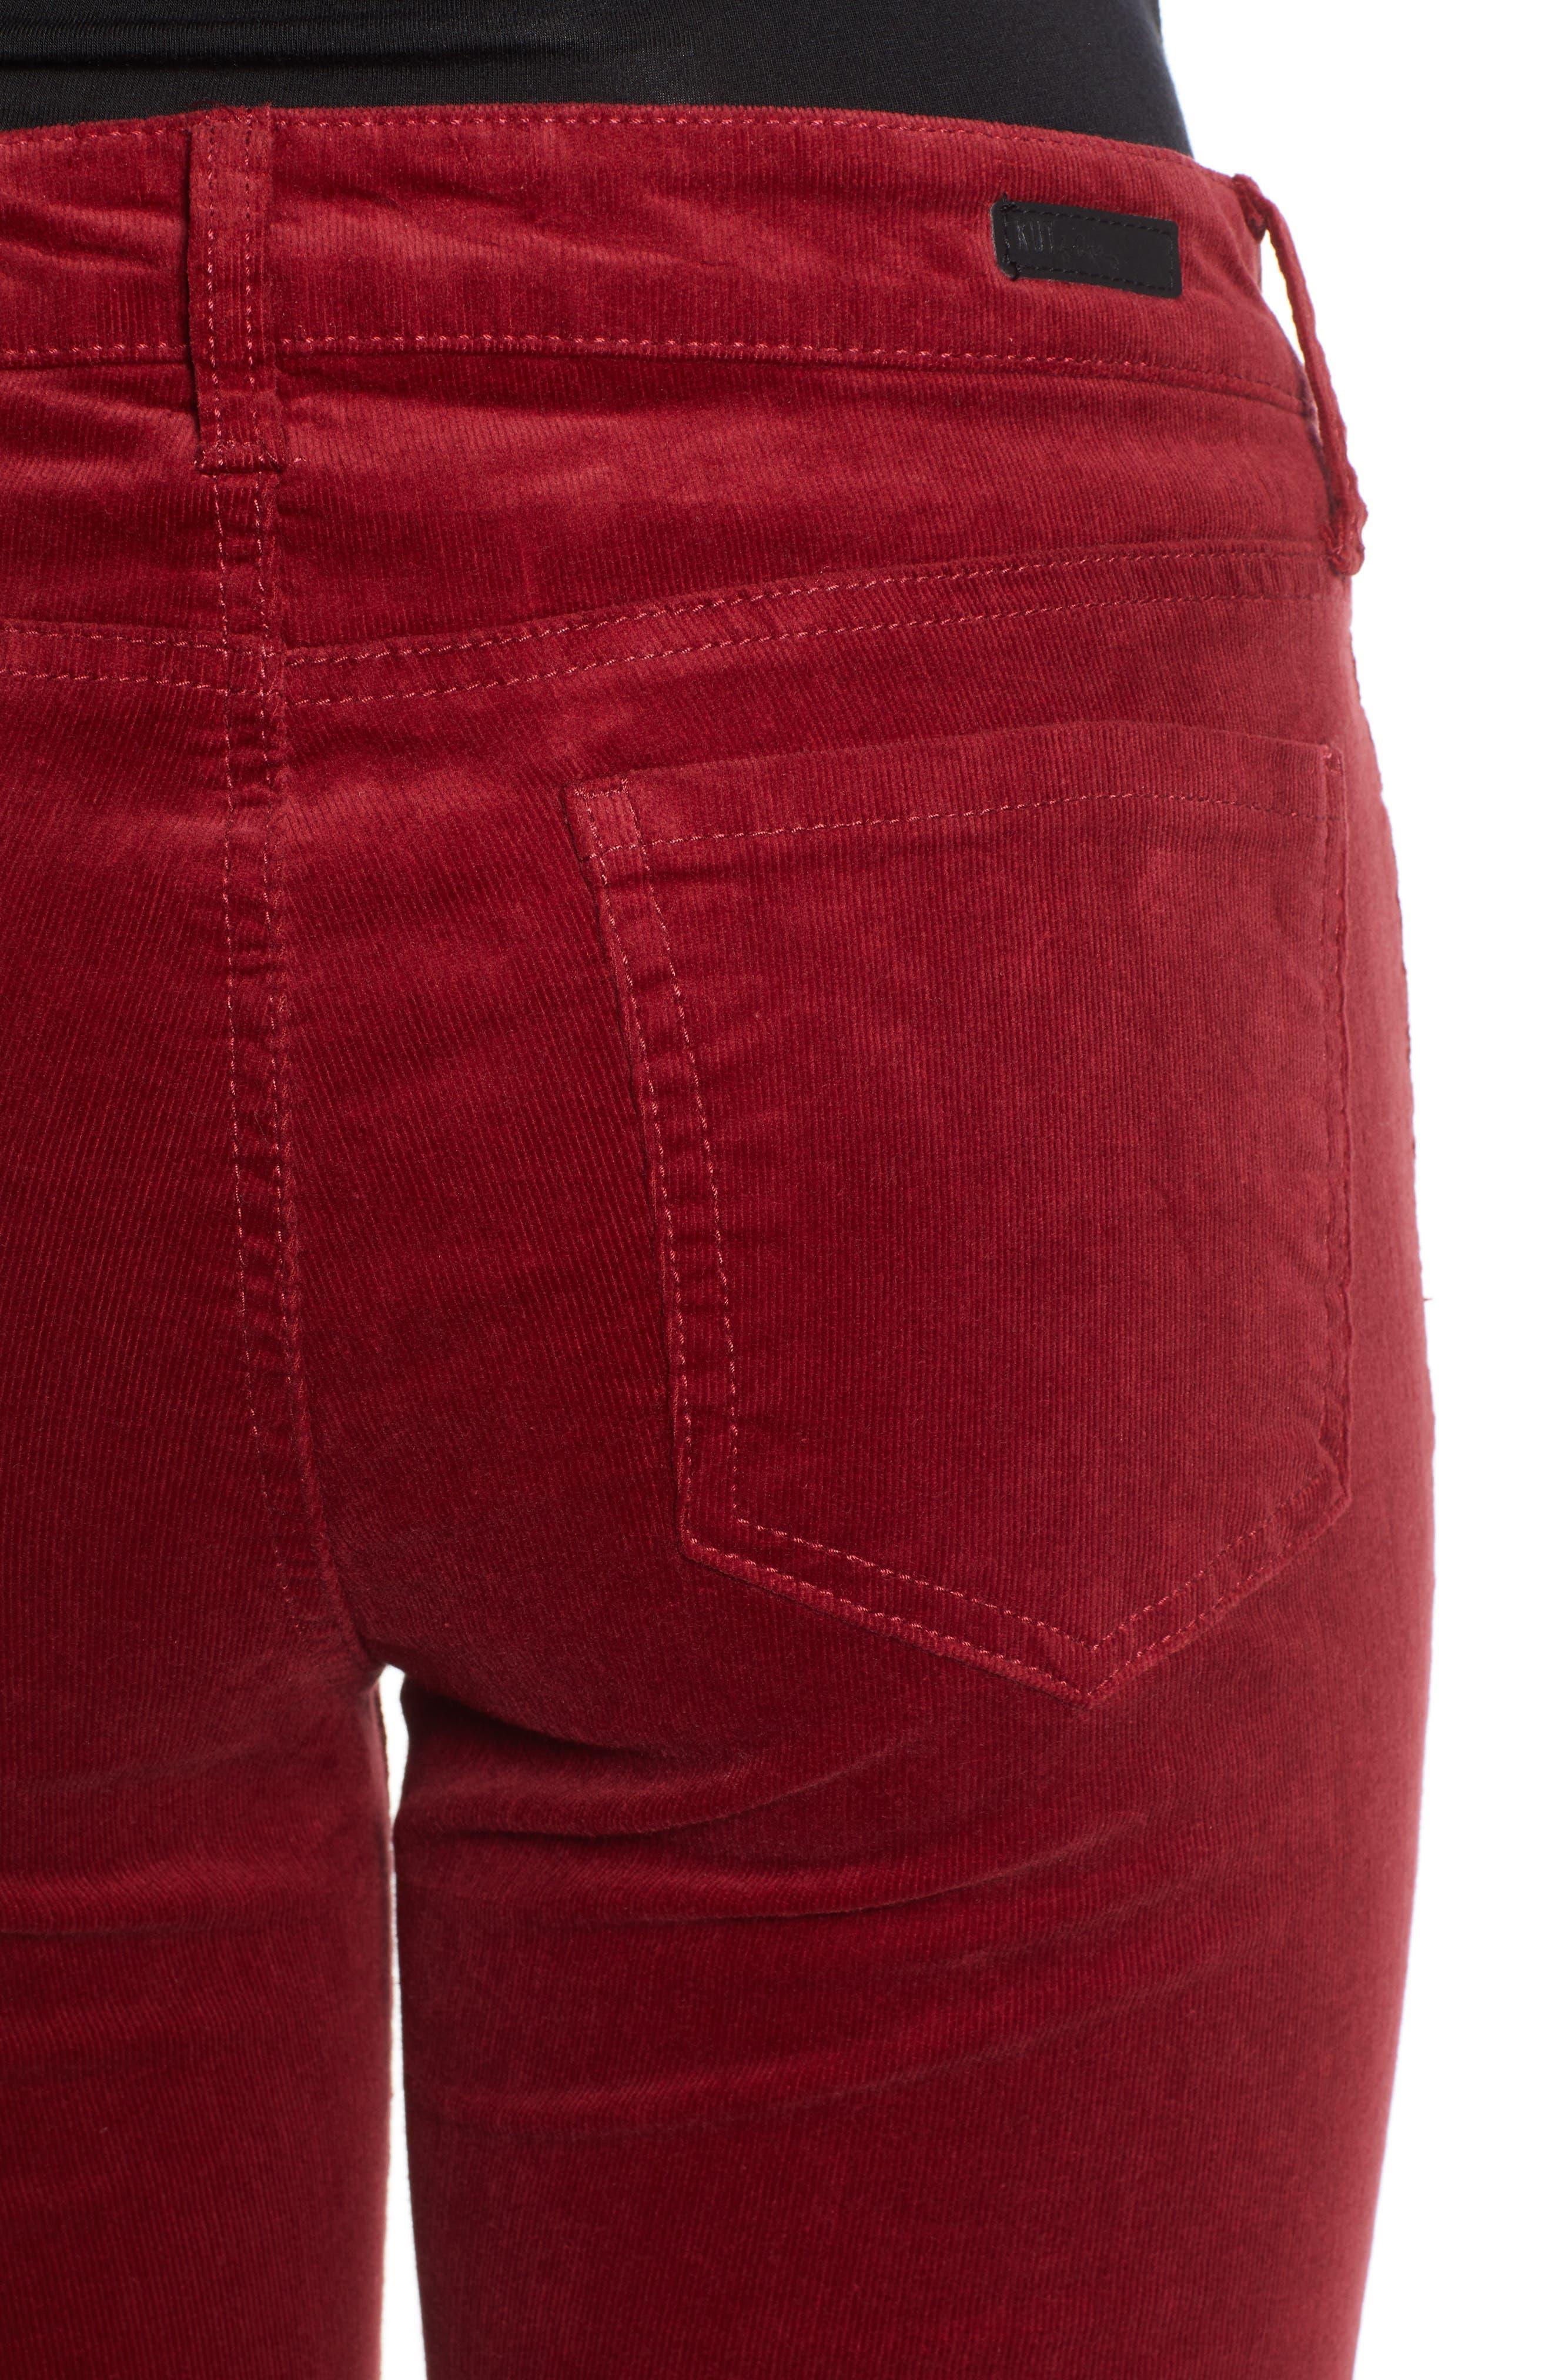 'Diana' Stretch Corduroy Skinny Pants,                             Alternate thumbnail 170, color,